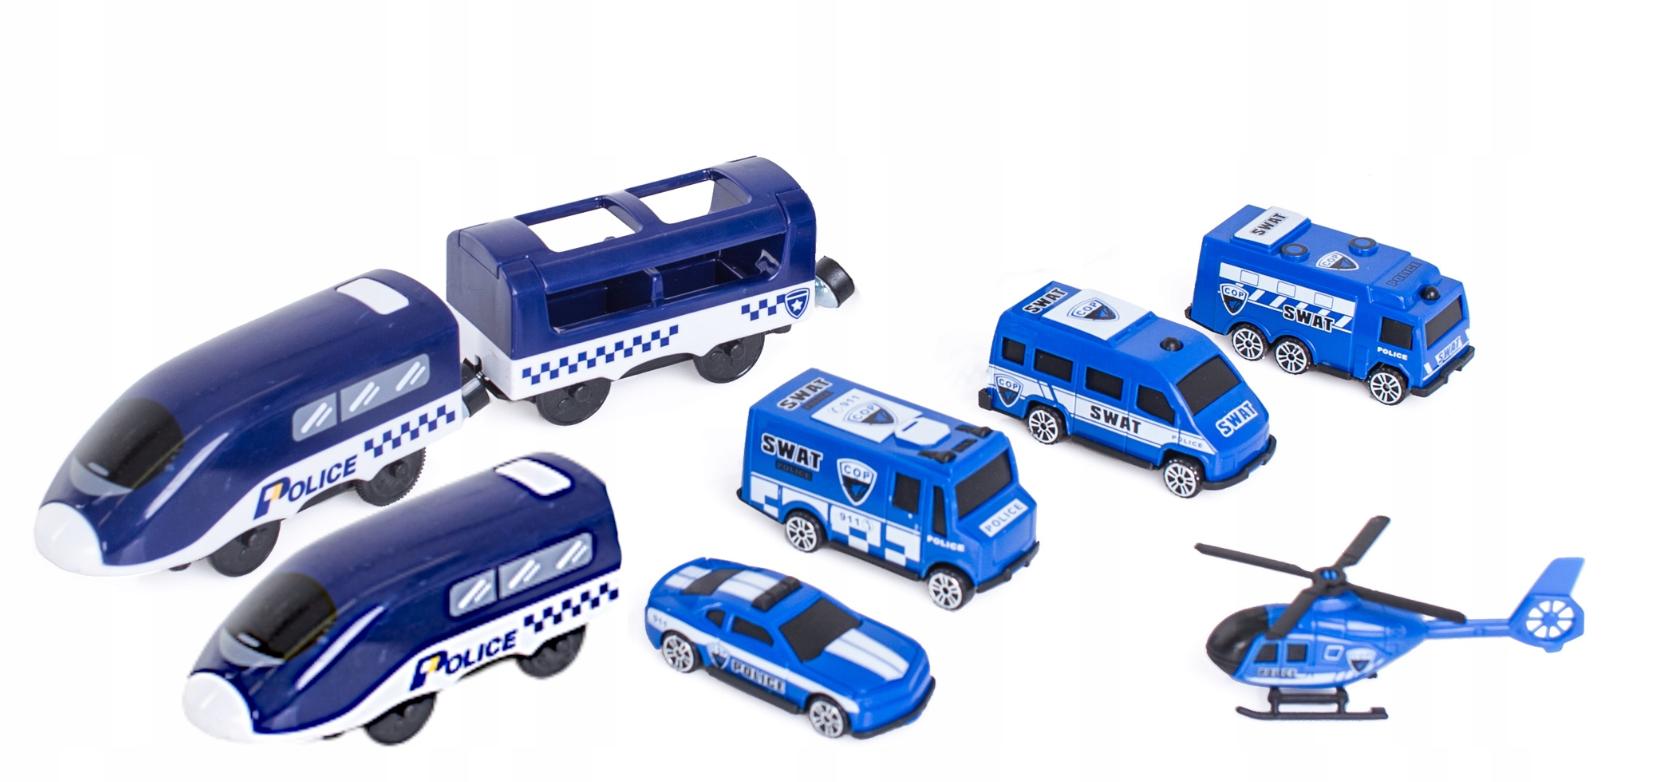 HračkyZaDobréKačky Dětská vláčkodráha Policie